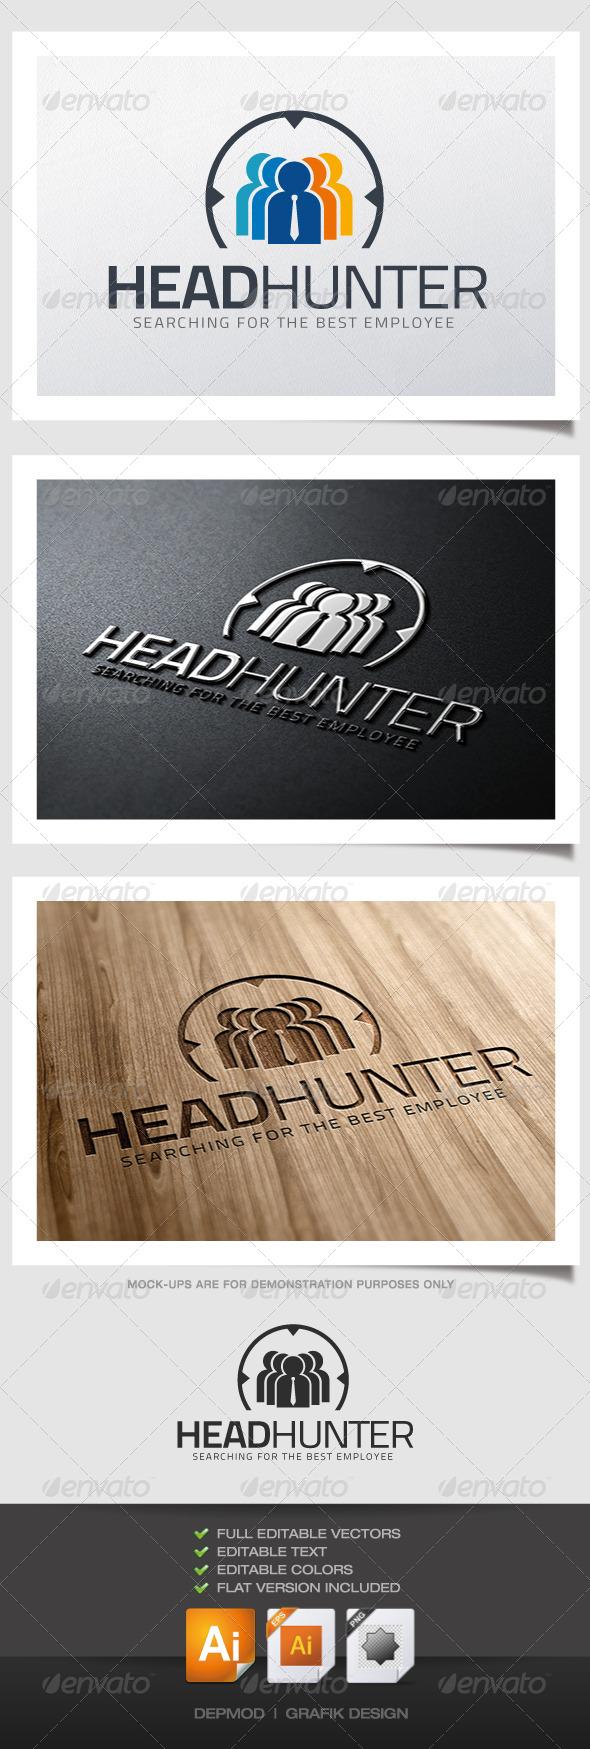 GraphicRiver Headhunter Logo 4627843